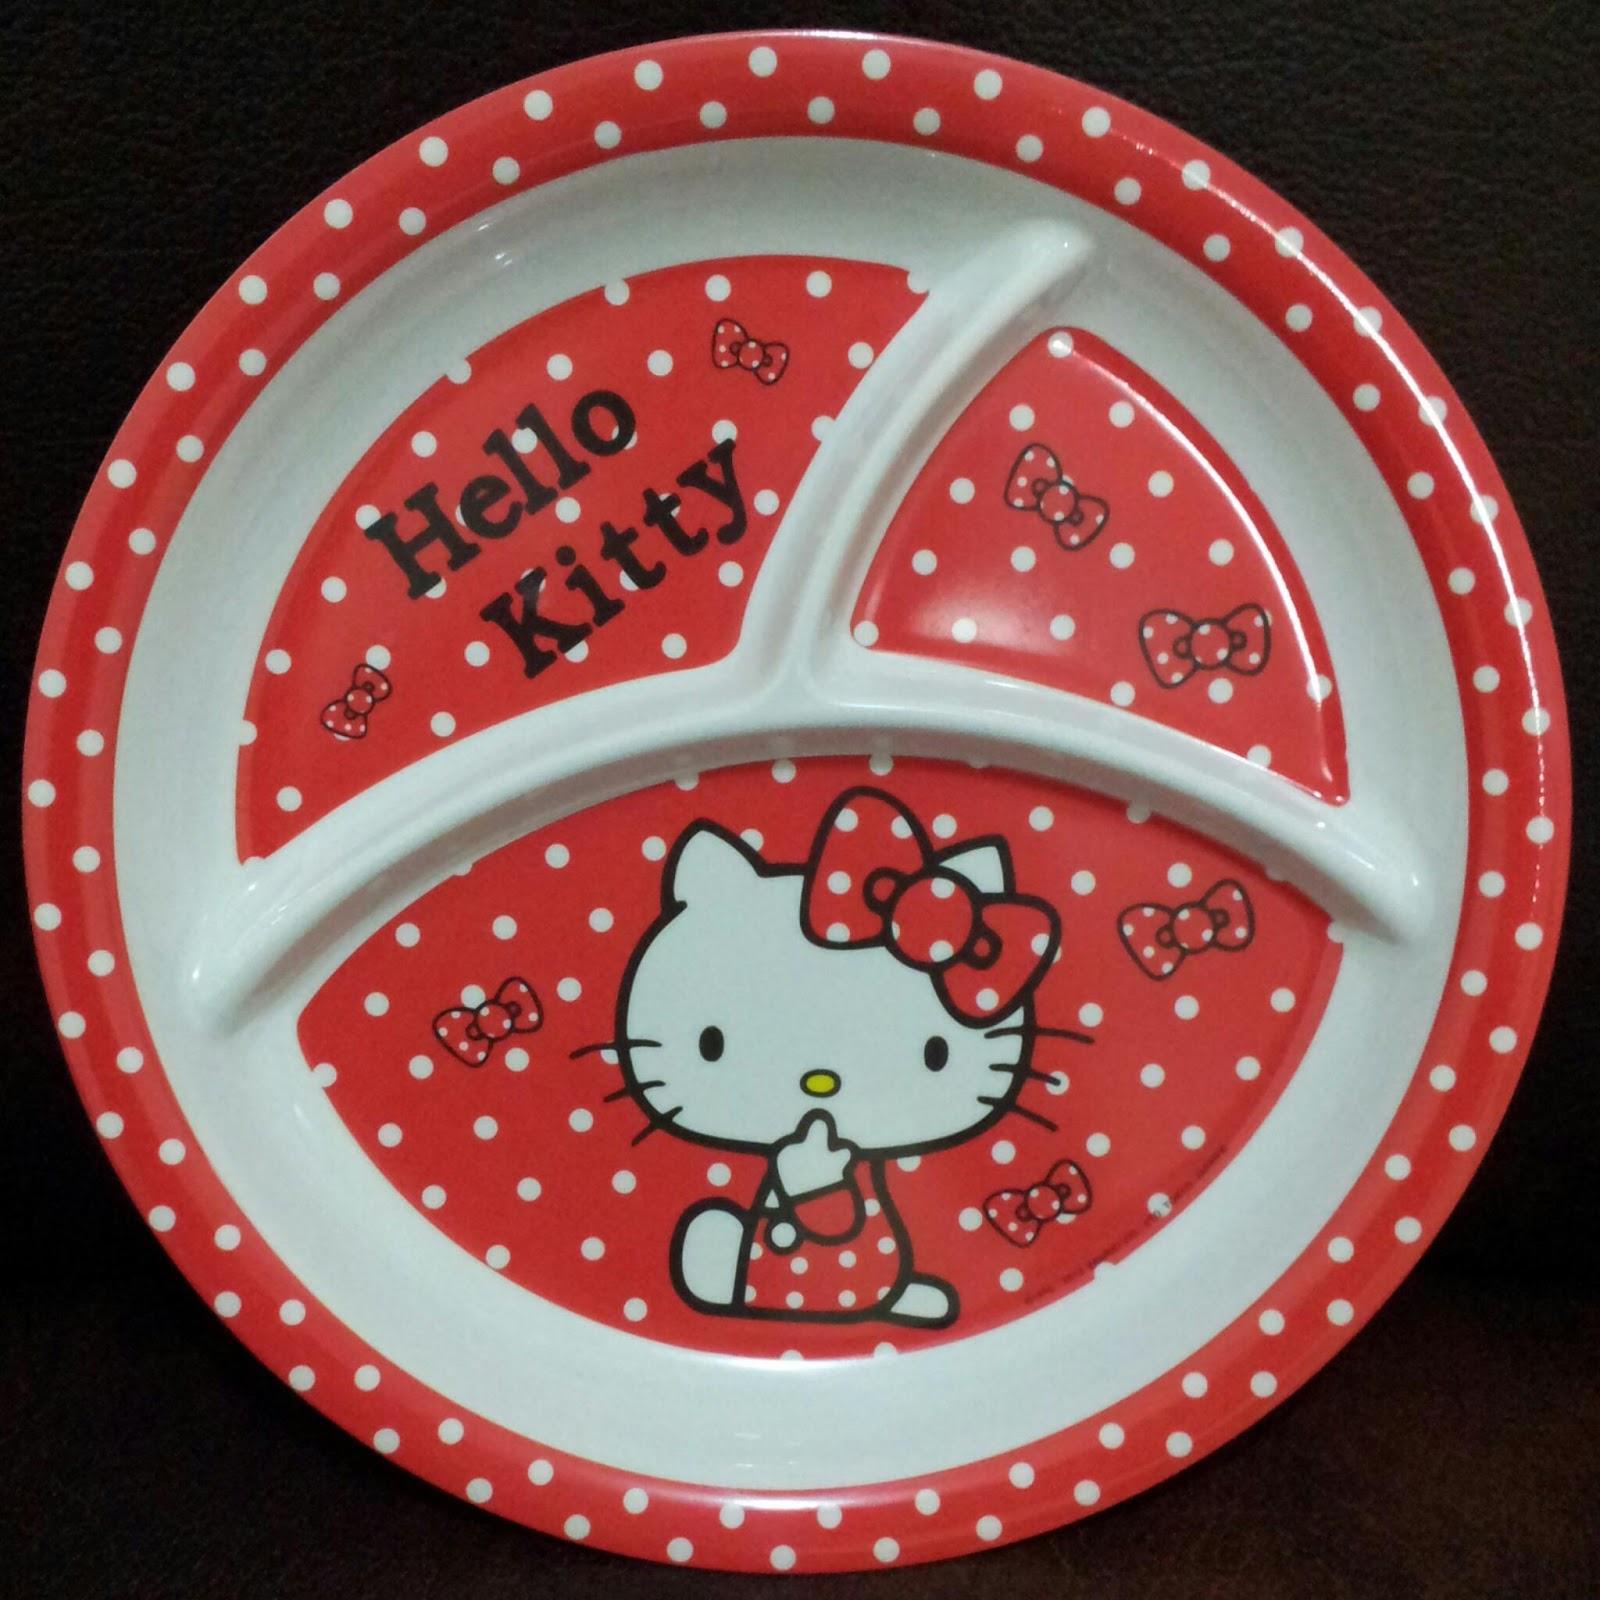 Jual Piring Melamin Sekat Hello Kitty Murah Grosir Ecer Besar Toko